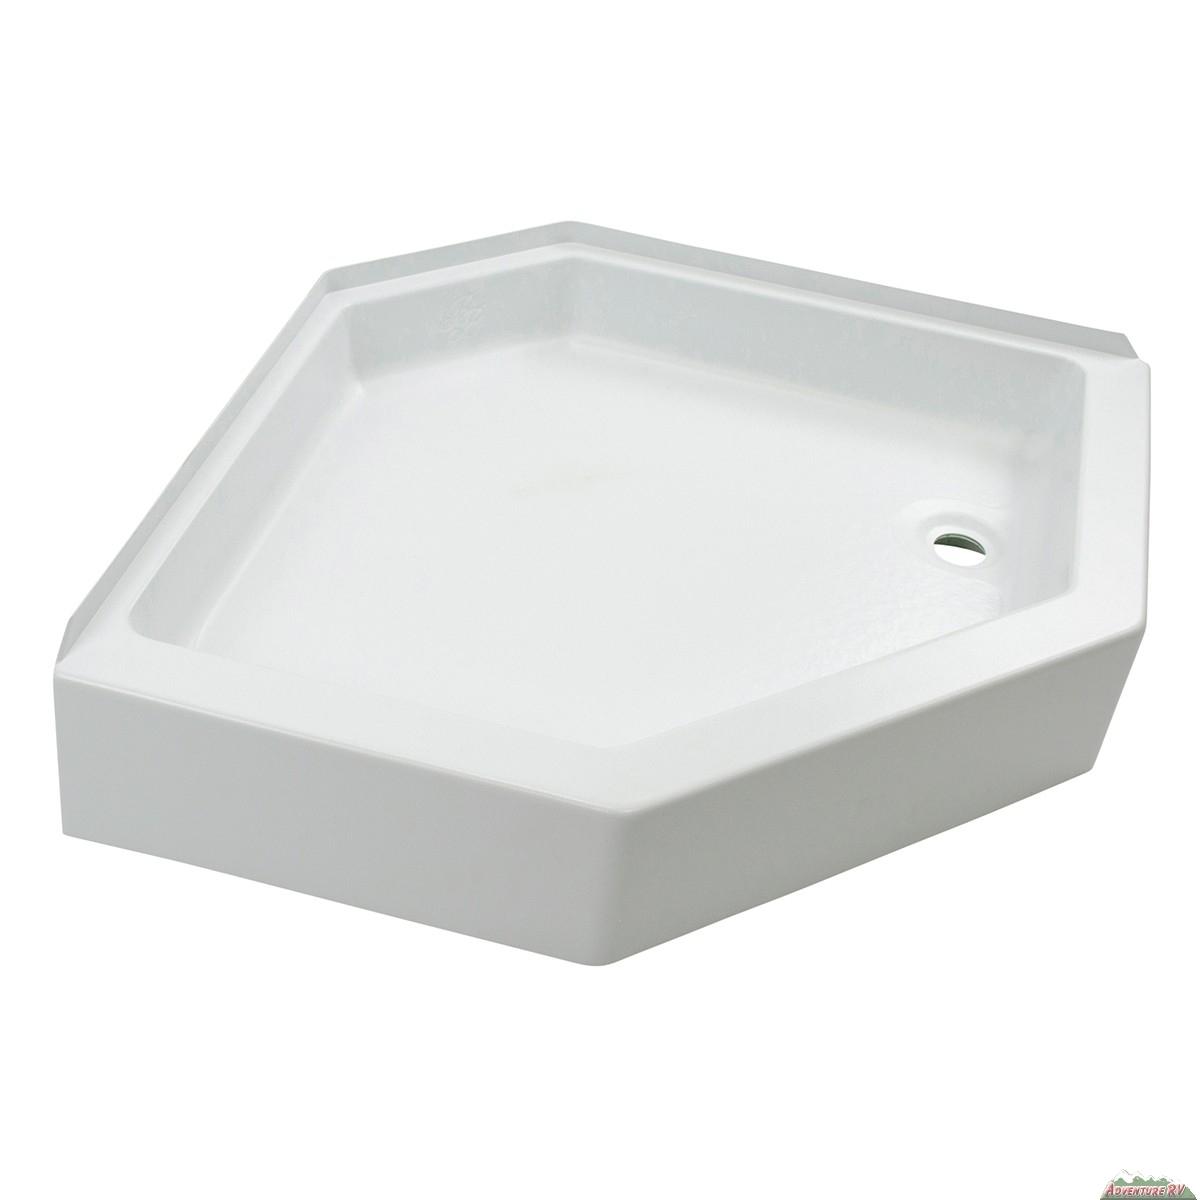 24 X 36 Shower Pan.Better Bath 24 X 36 White Shower Pan Rhc